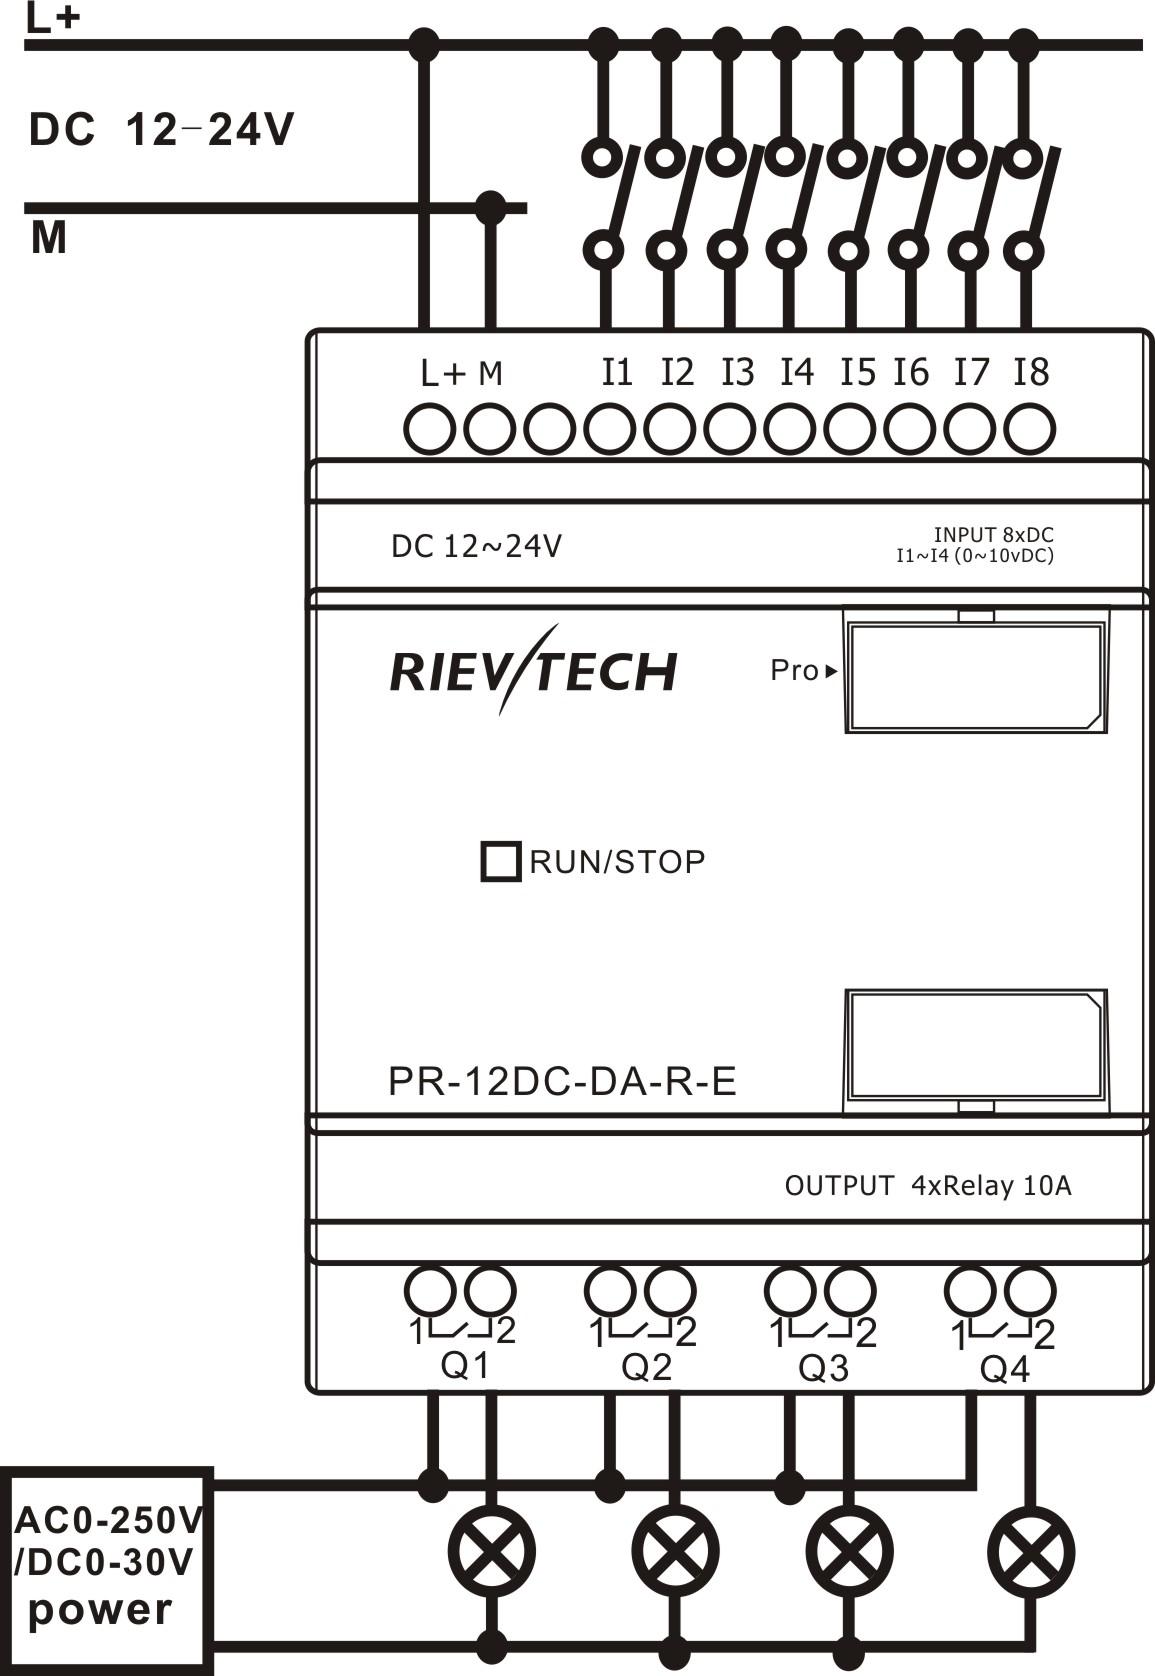 Superb Pr 12Dc Da R E Buy Smart Relay Siemens Logo Easy Product On Rievtech Wiring Digital Resources Remcakbiperorg